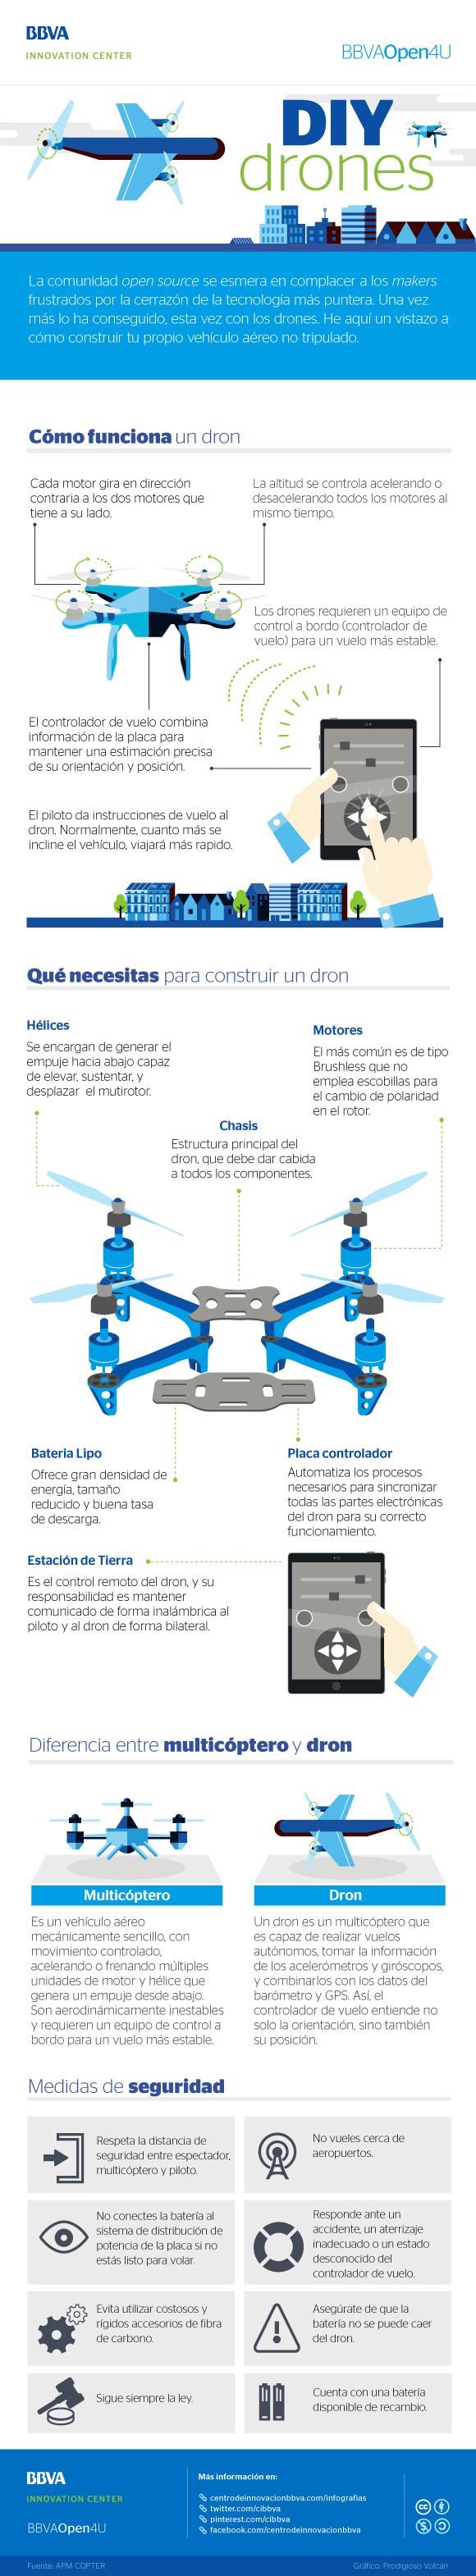 Infografía: DIY dron